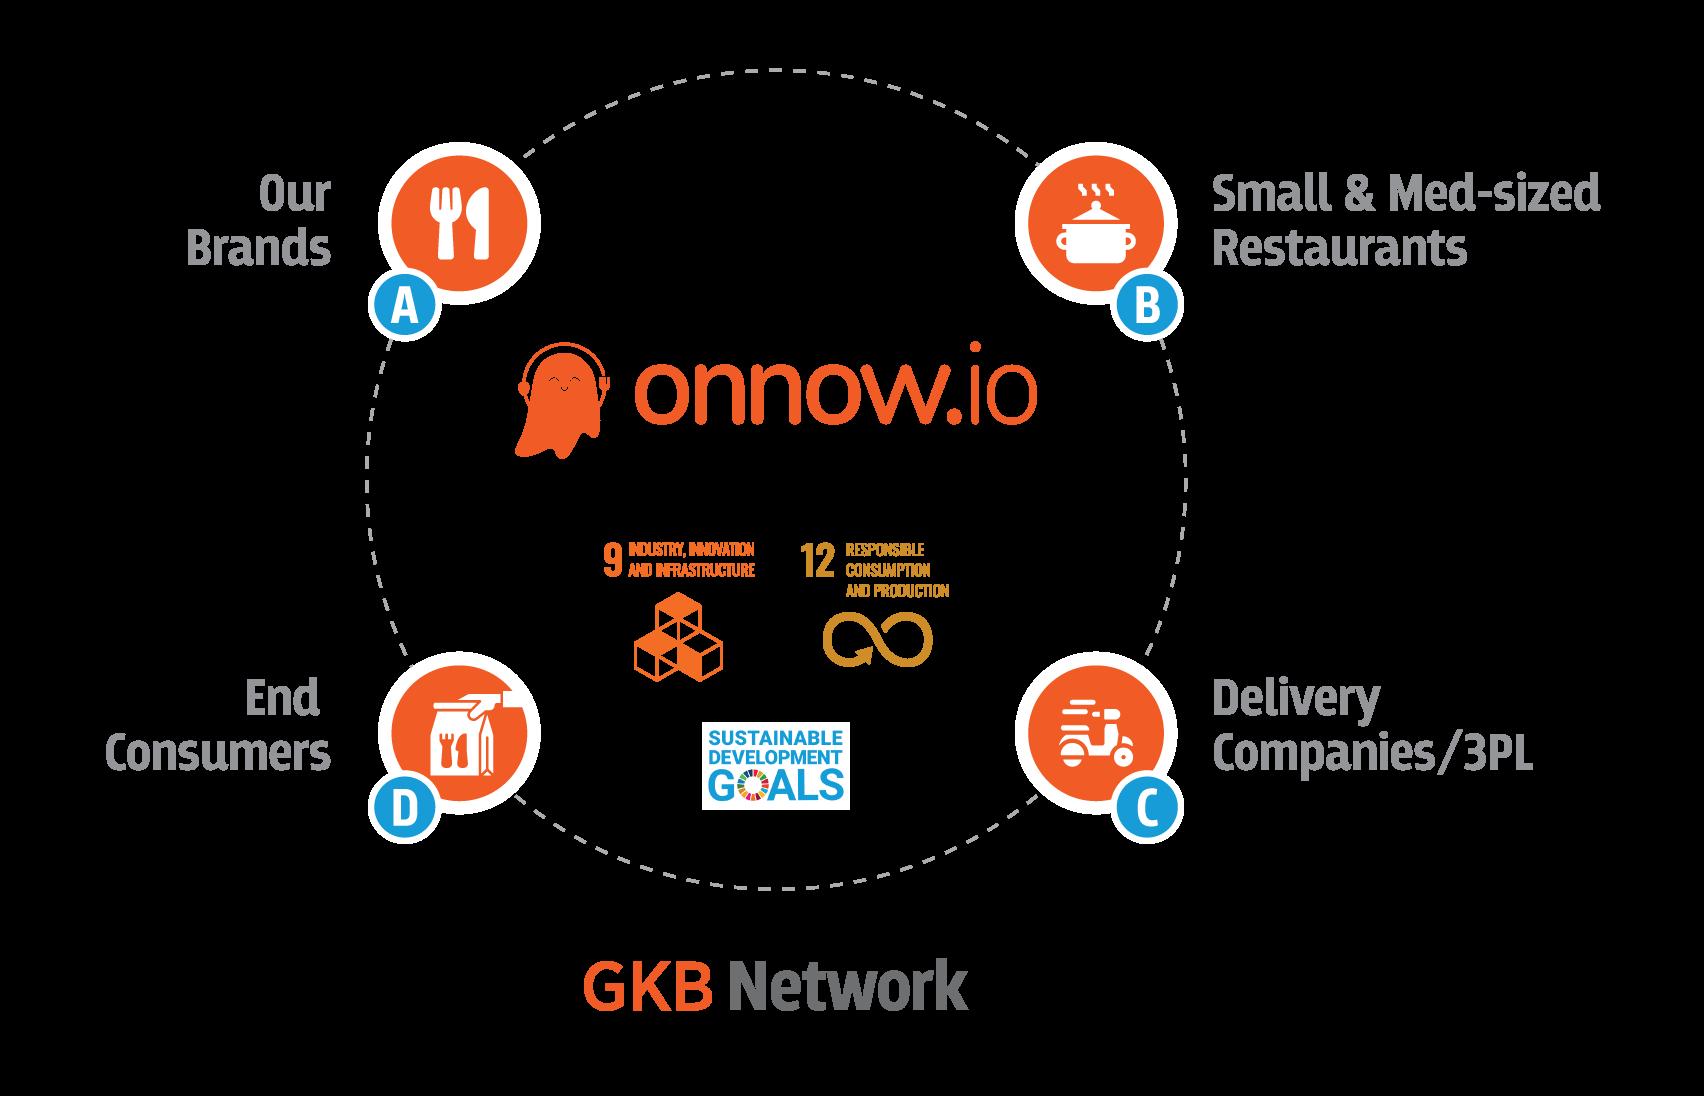 GKB Network